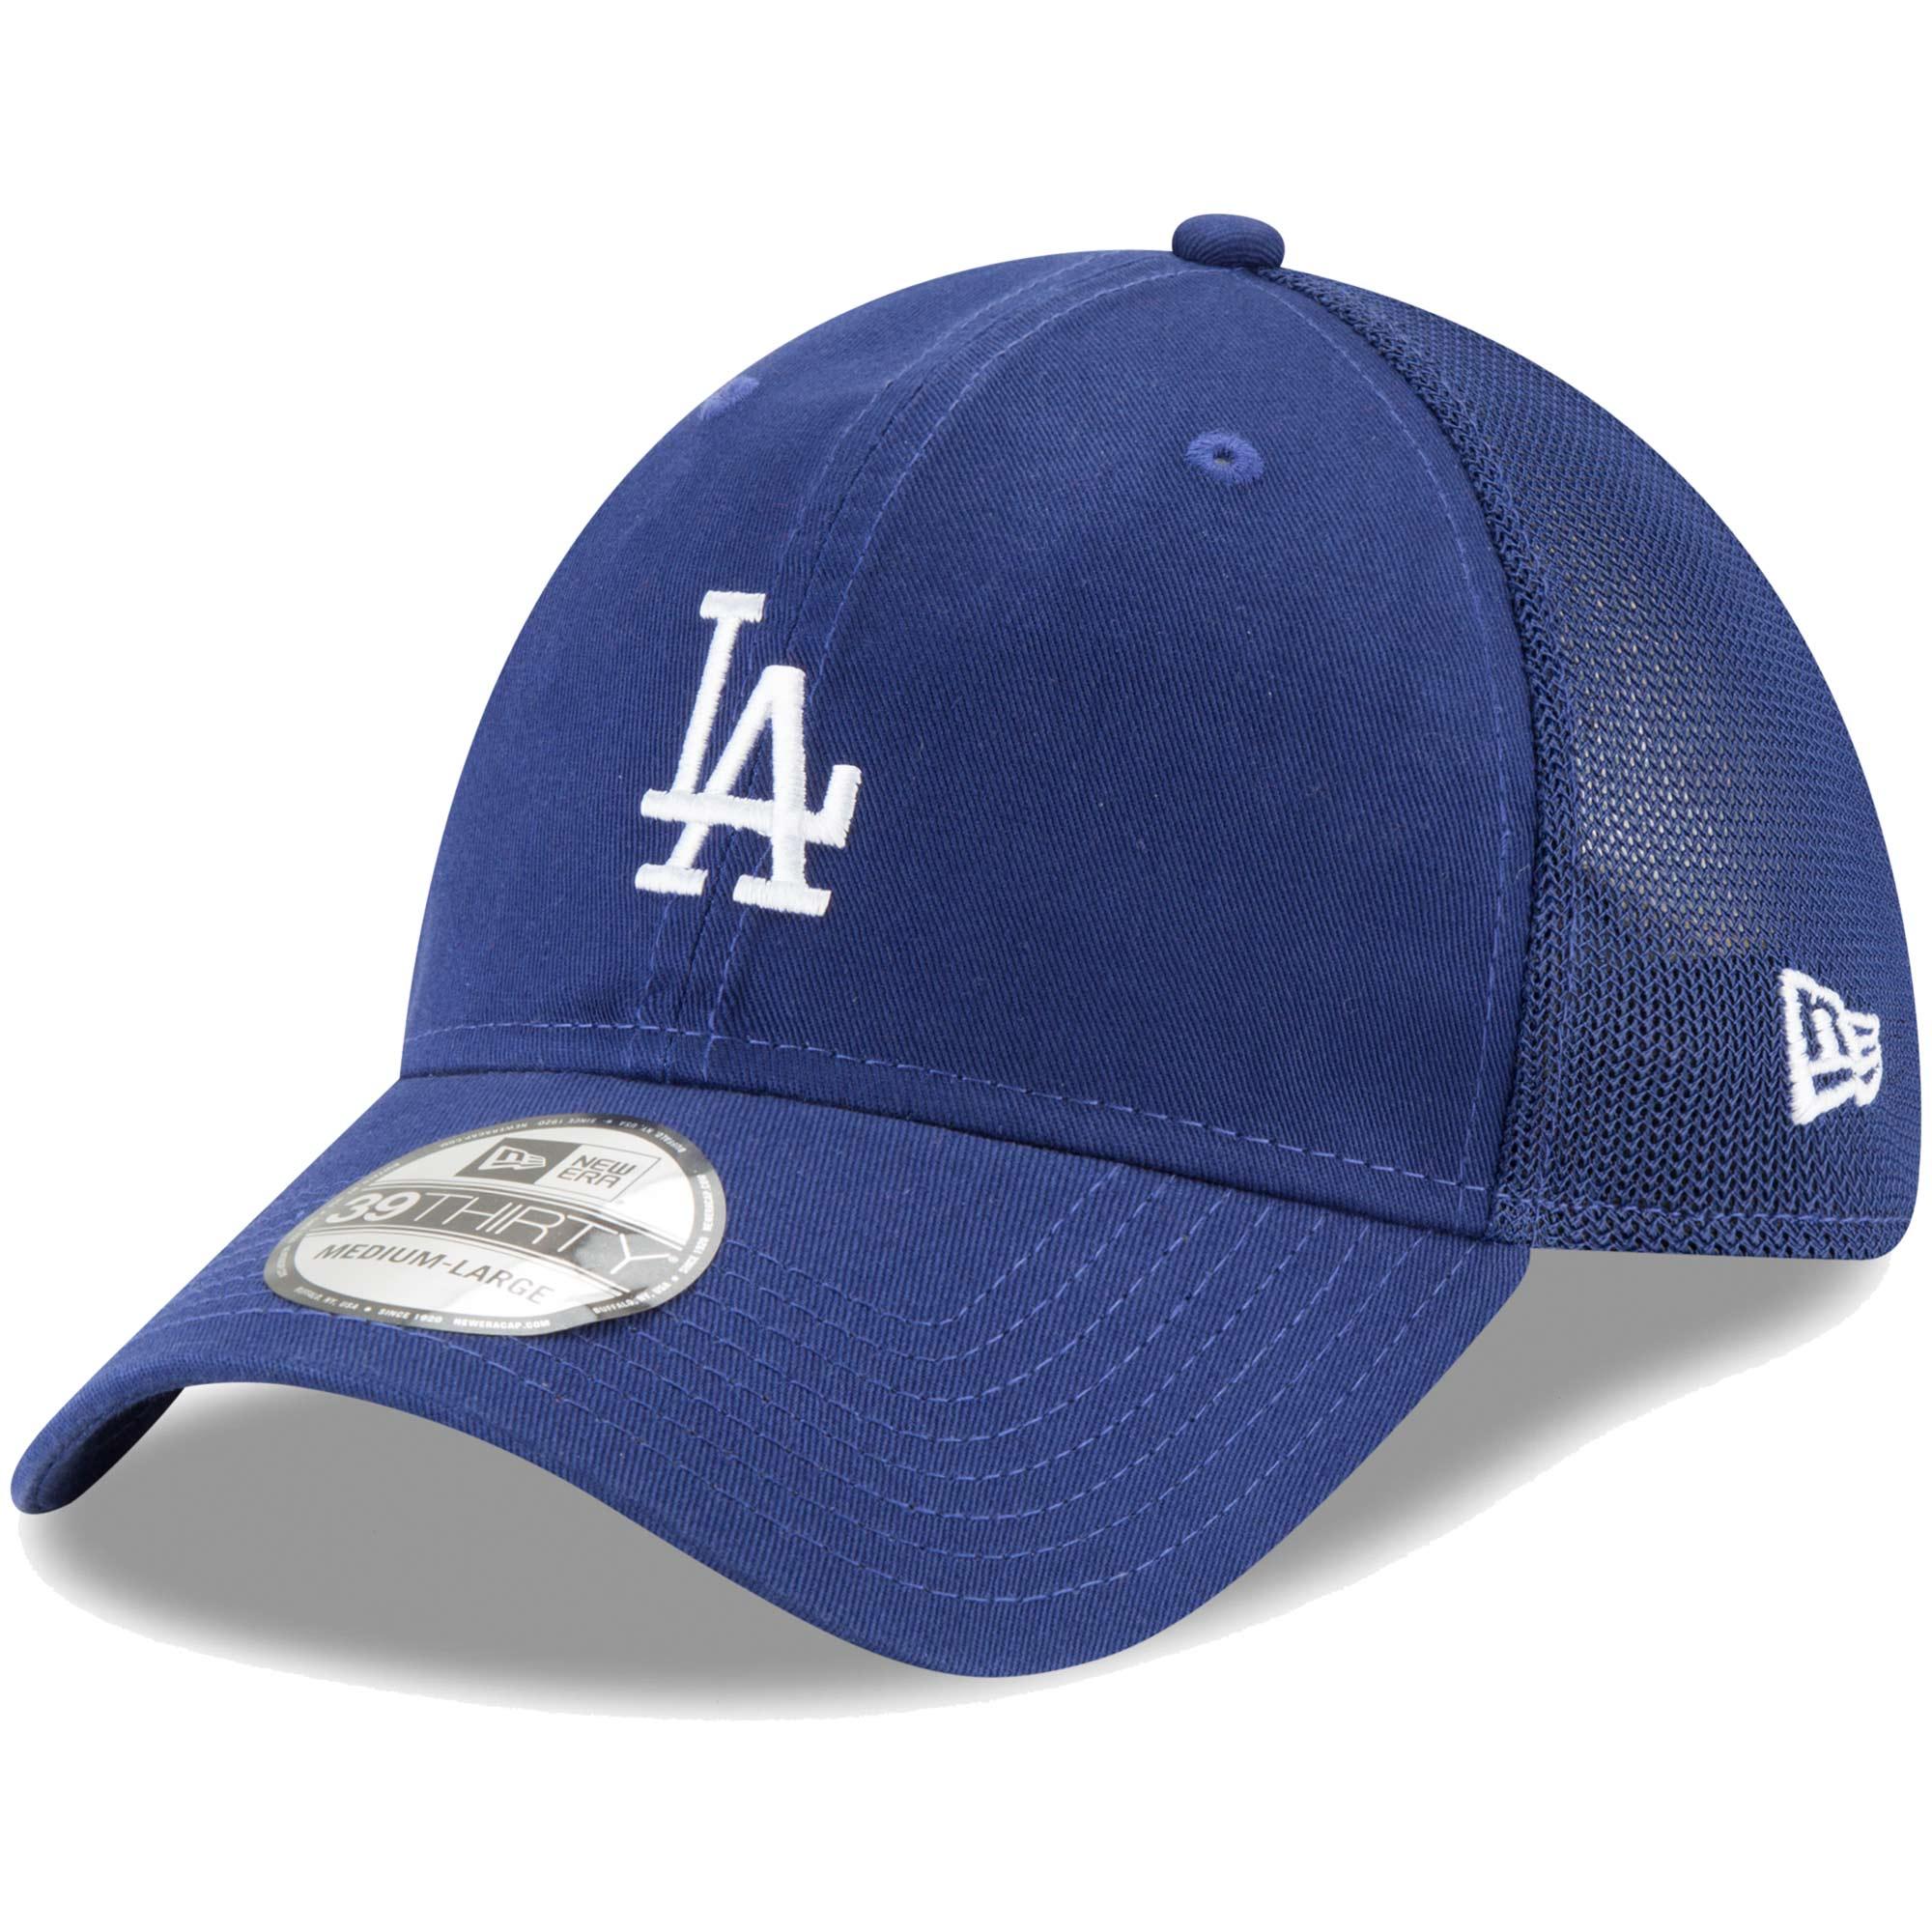 Los Angeles Dodgers New Era Team Precision 39THIRTY Flex Hat - Royal